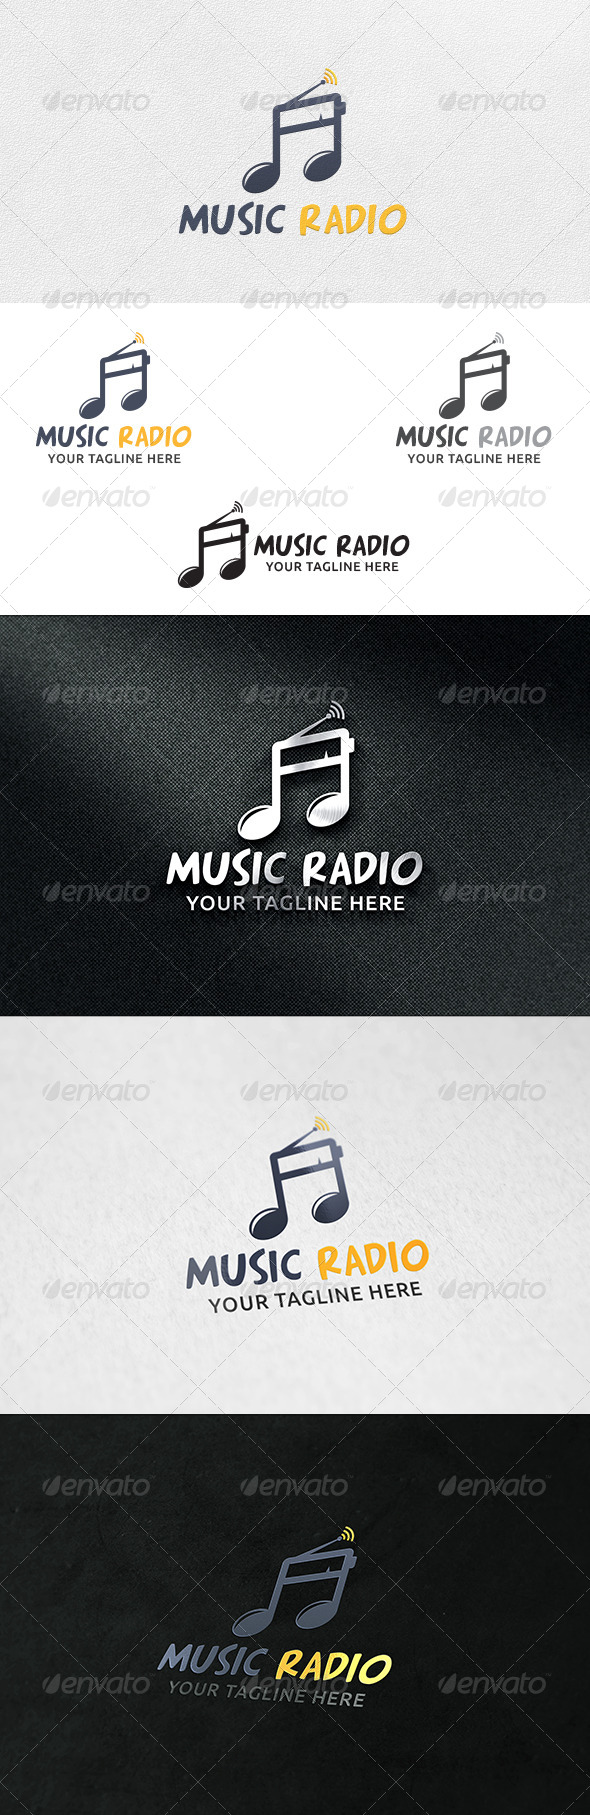 Music Radio - Logo Template - Symbols Logo Templates